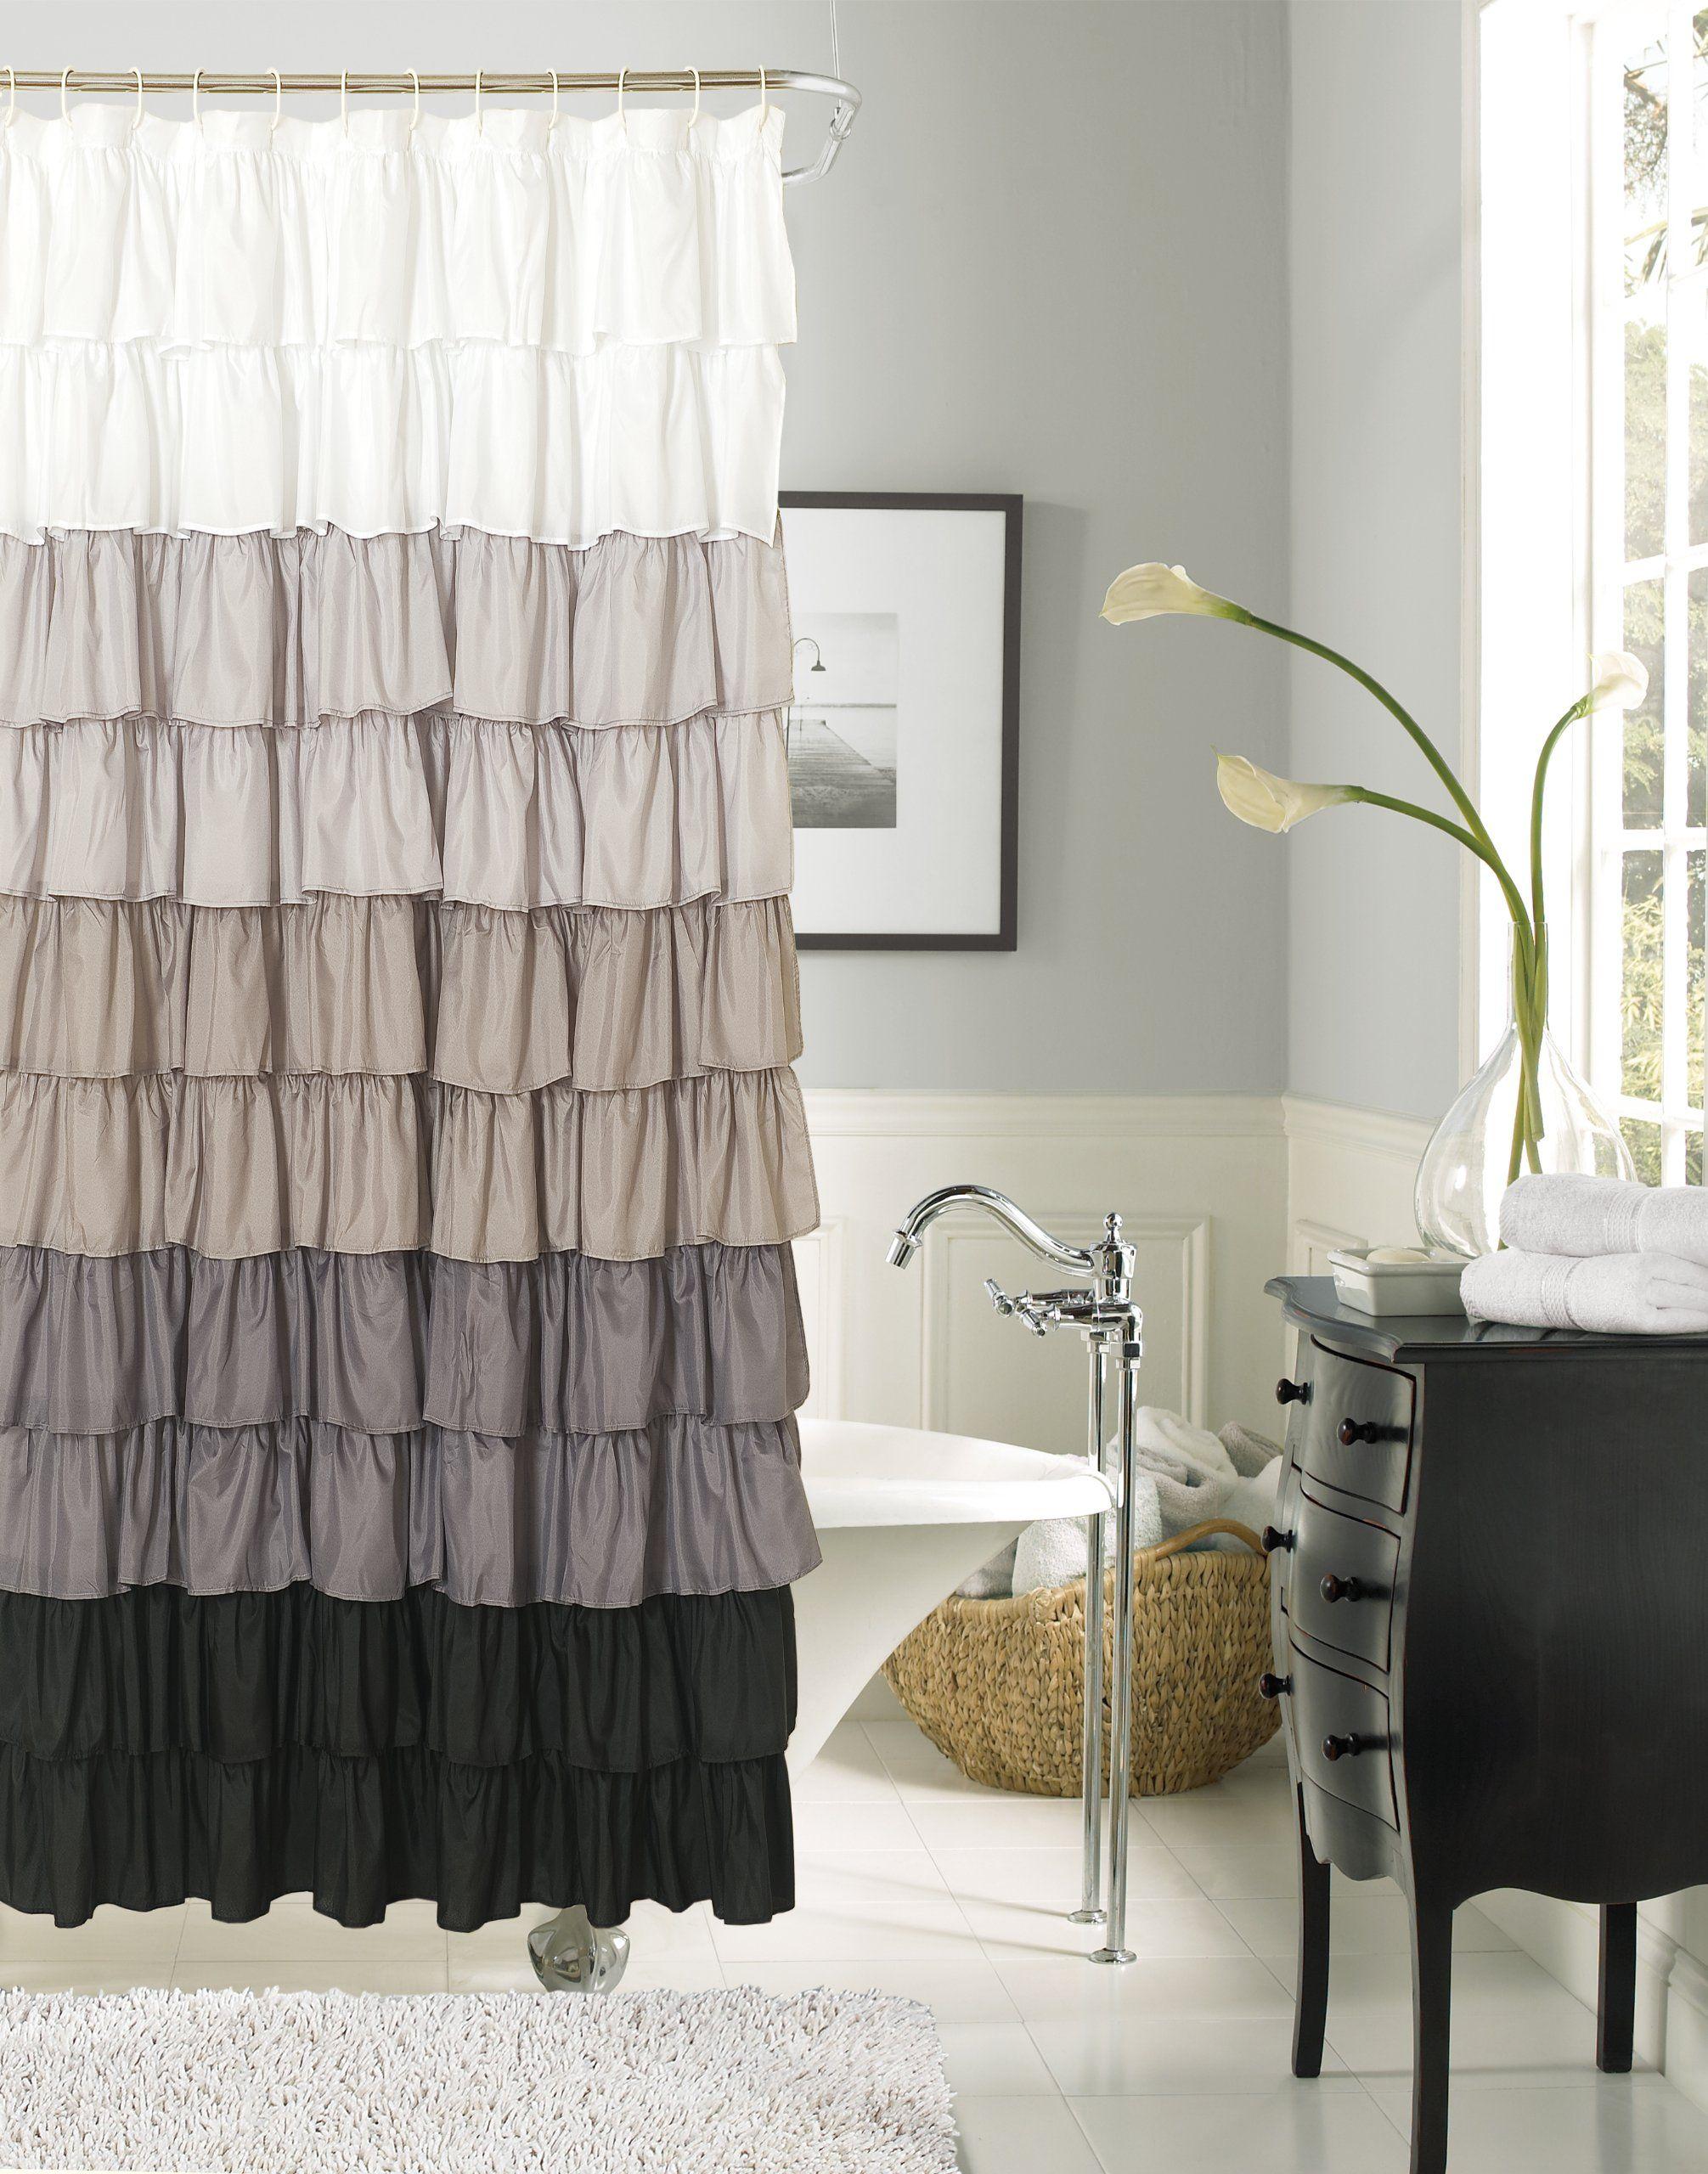 Amazon Com Dainty Home Flamenco Ruffled Shower Curtain 72 By 72